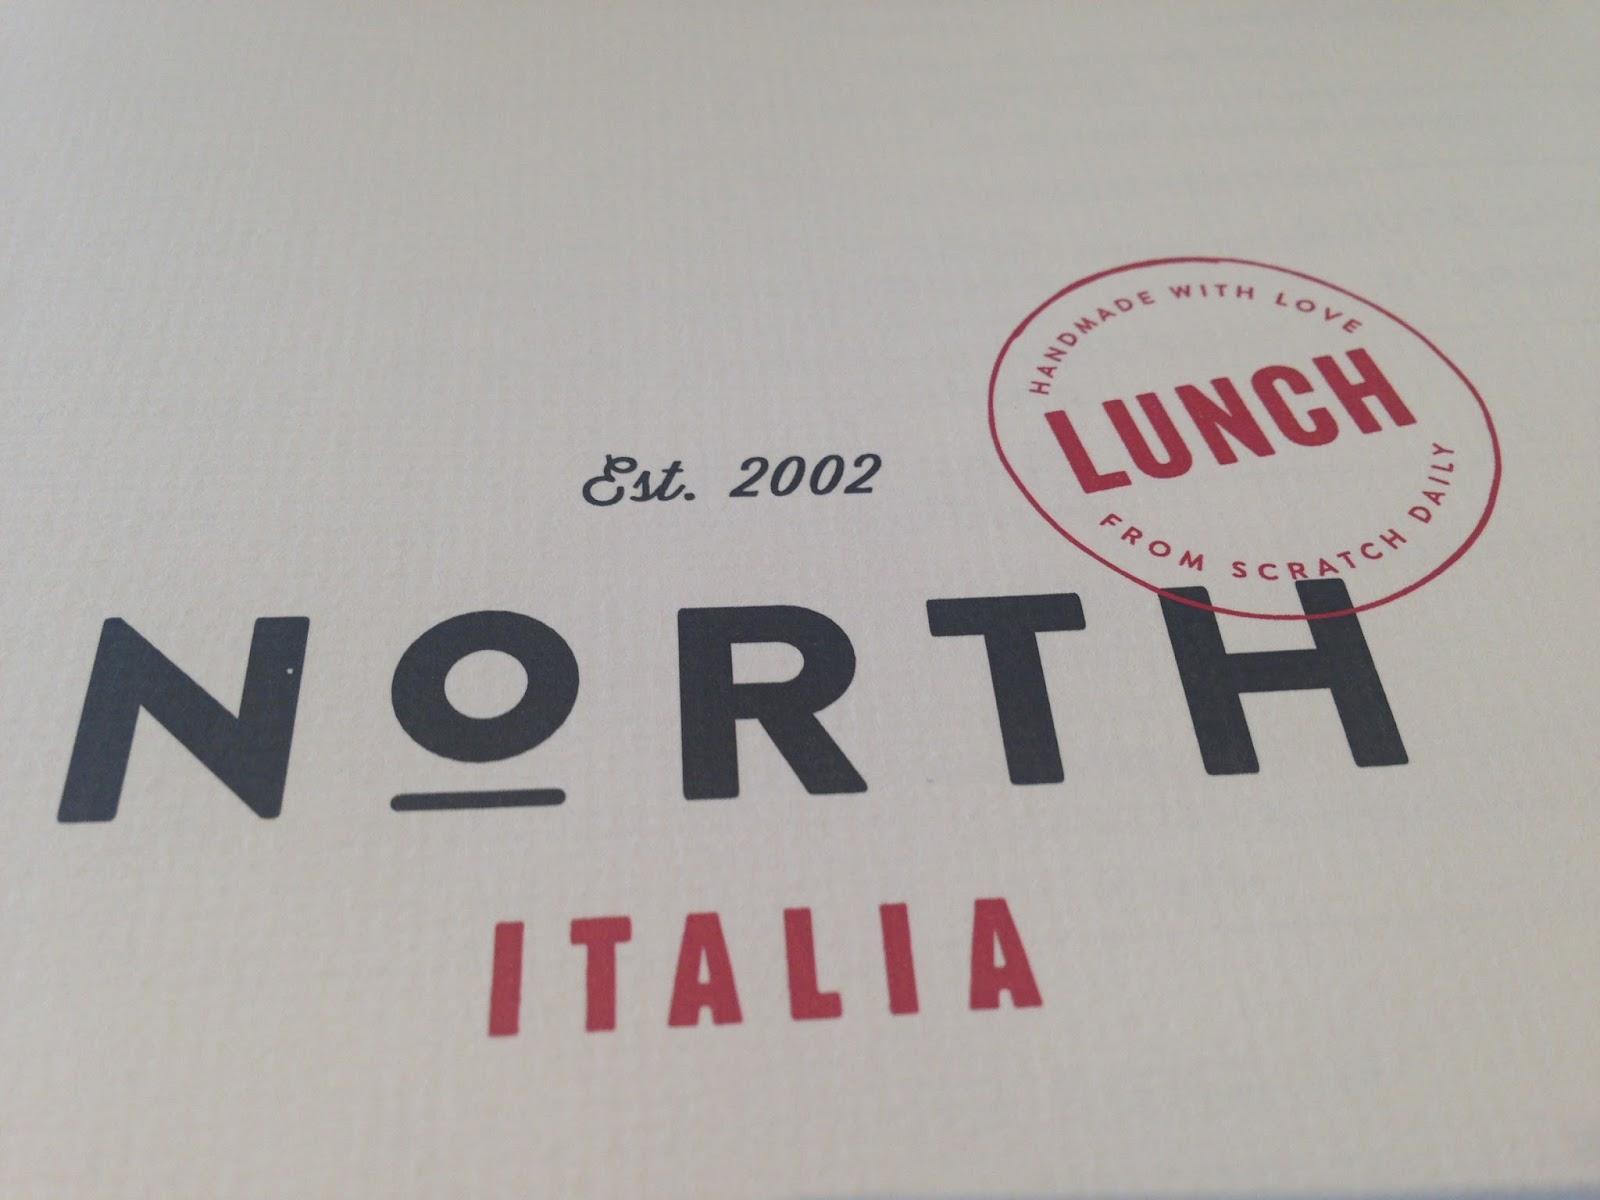 North Italia Logo Patty And David Said. North Italia